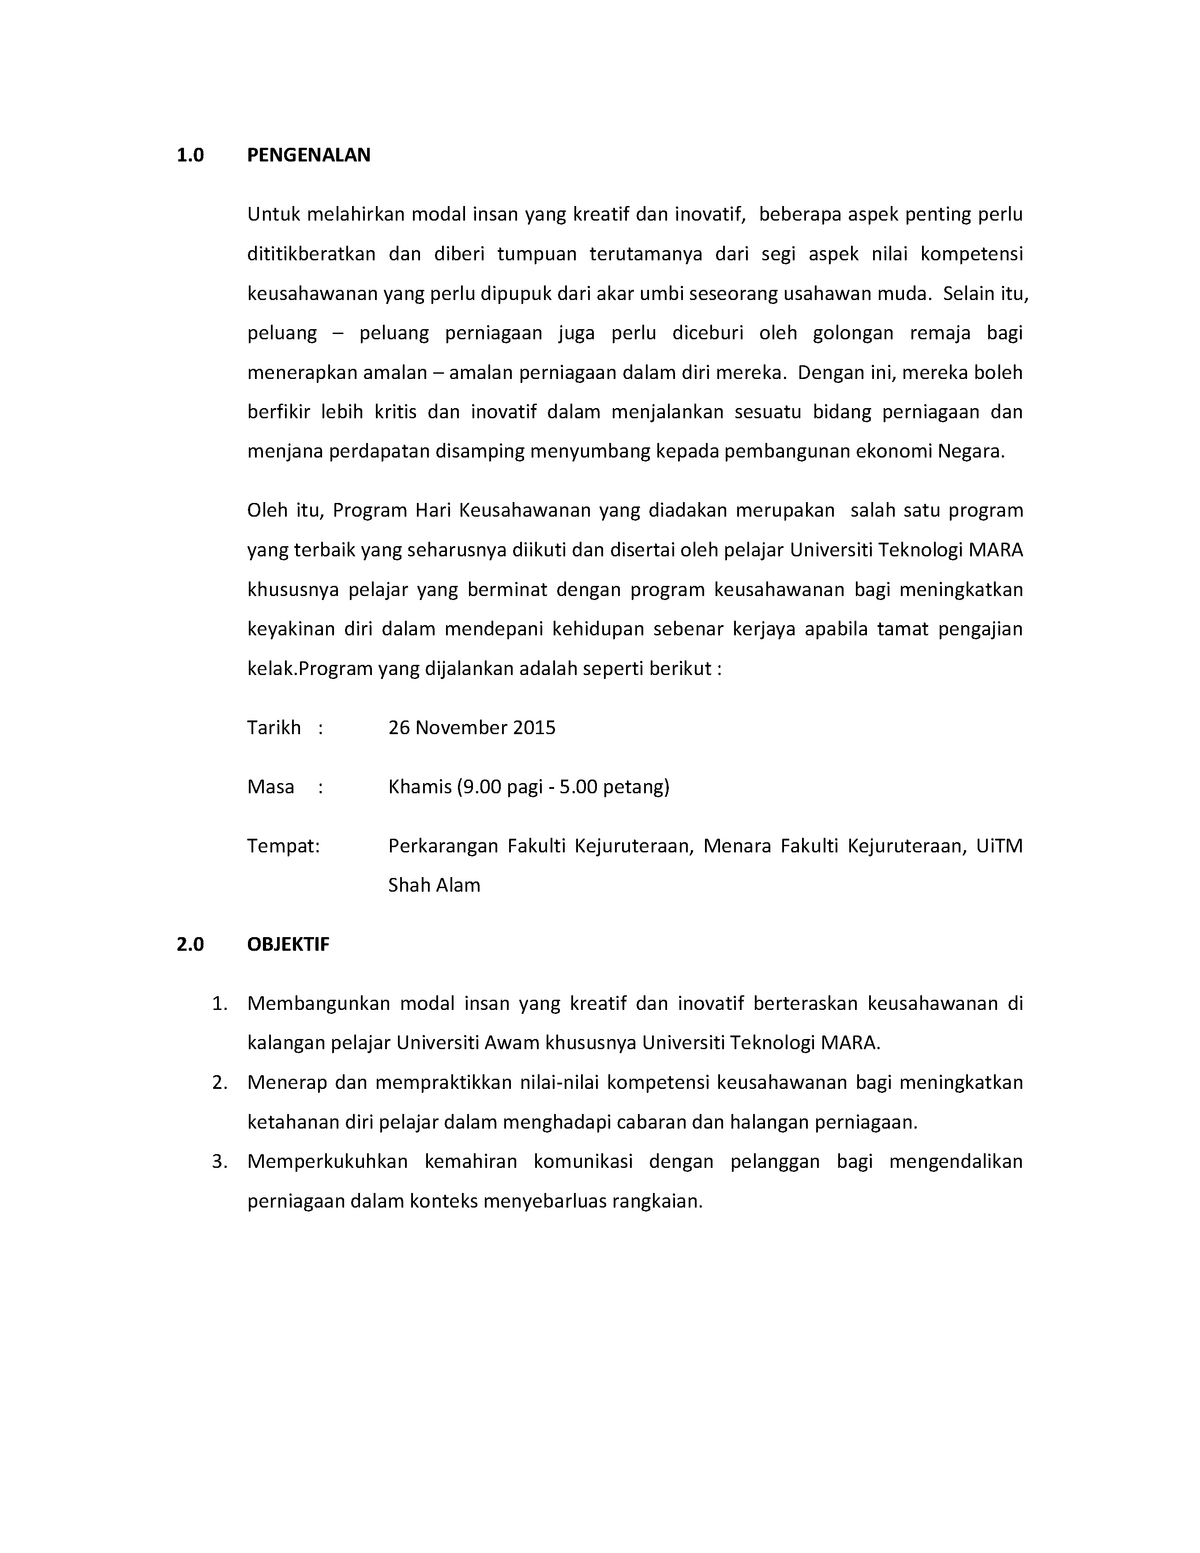 Report Jualan Writing Assignment By Hazree Tajuddin Studocu